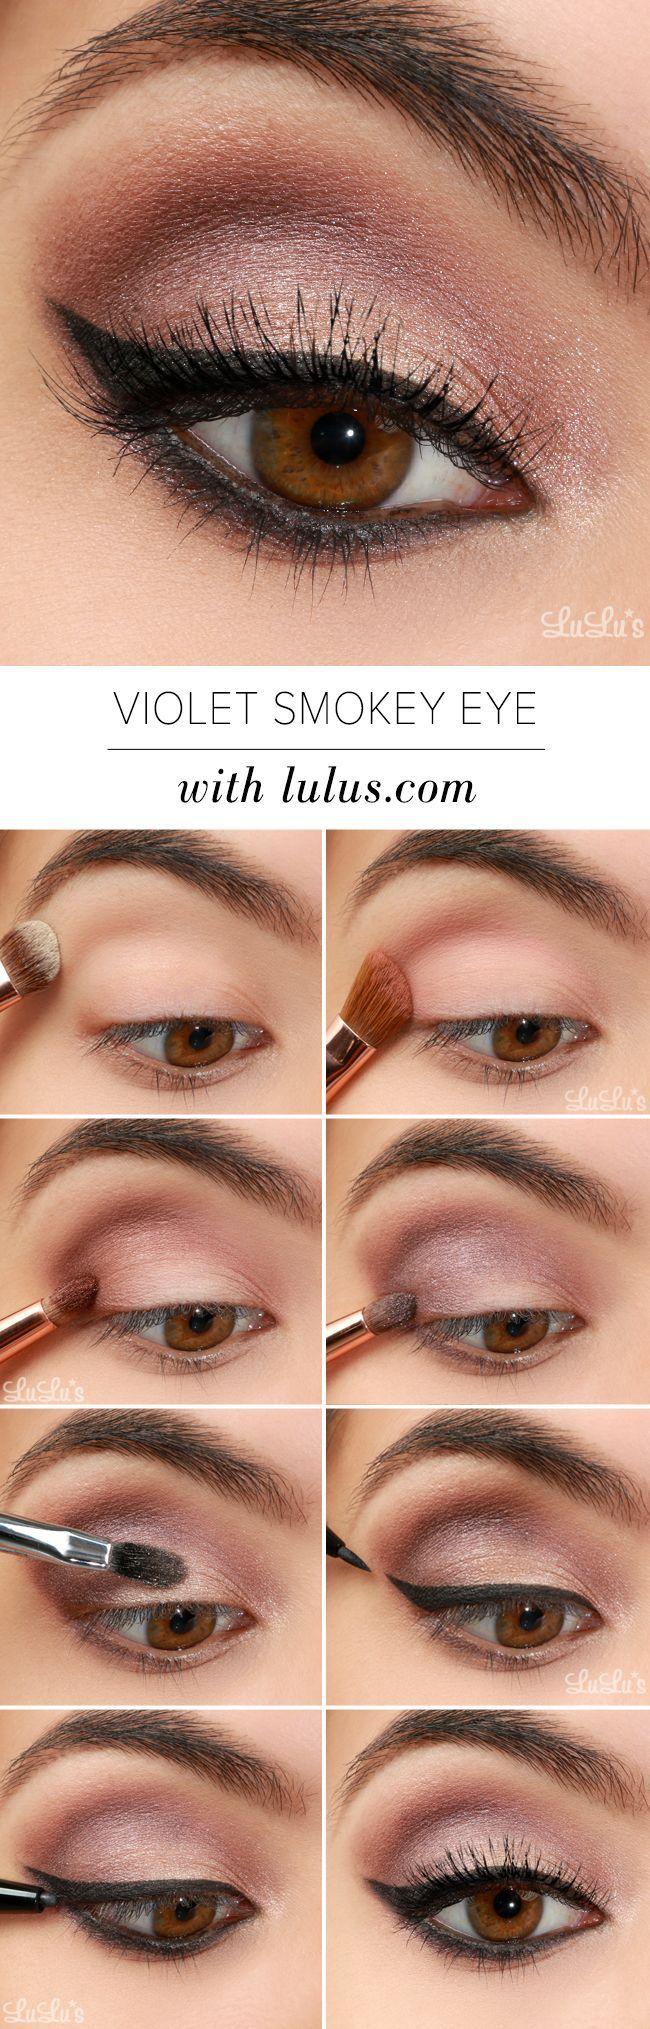 Maquillage Yeux Image Description LuLu * s How-To: Violet Smokey Eye Maquillage Tutoriel